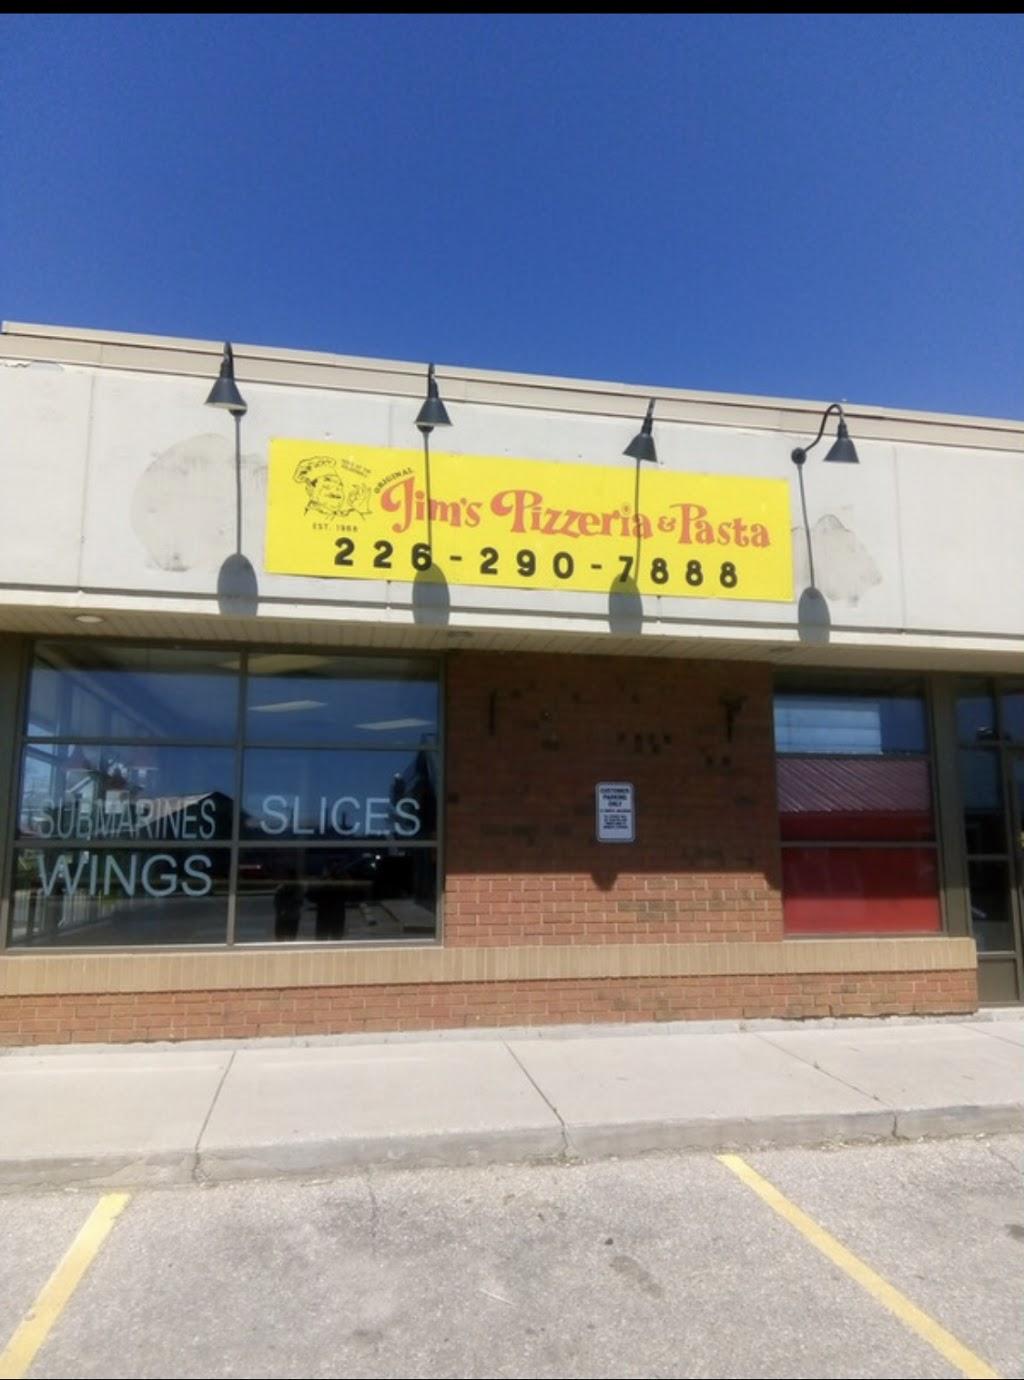 Original Jim's Pizzeria & Pasta | restaurant | 32 Walker St, Port Dover, ON N0A 1N0, Canada | 2262907888 OR +1 226-290-7888